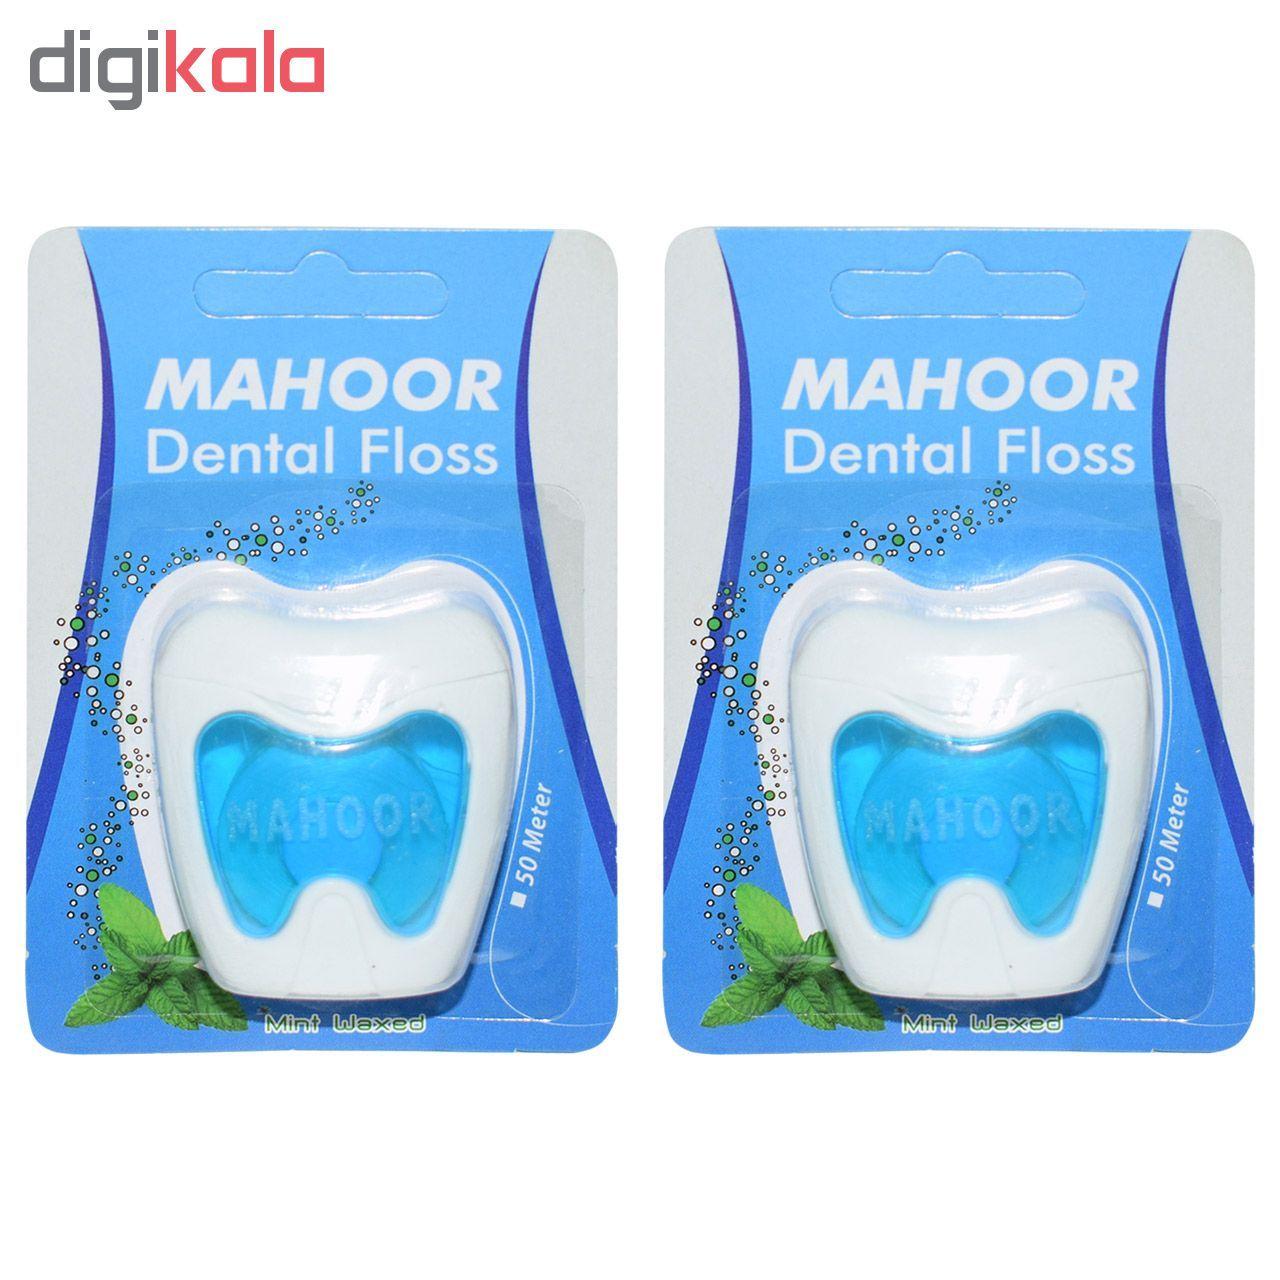 نخ دندان ماهور مدل Dental Floss بسته 2 عددی  main 1 1